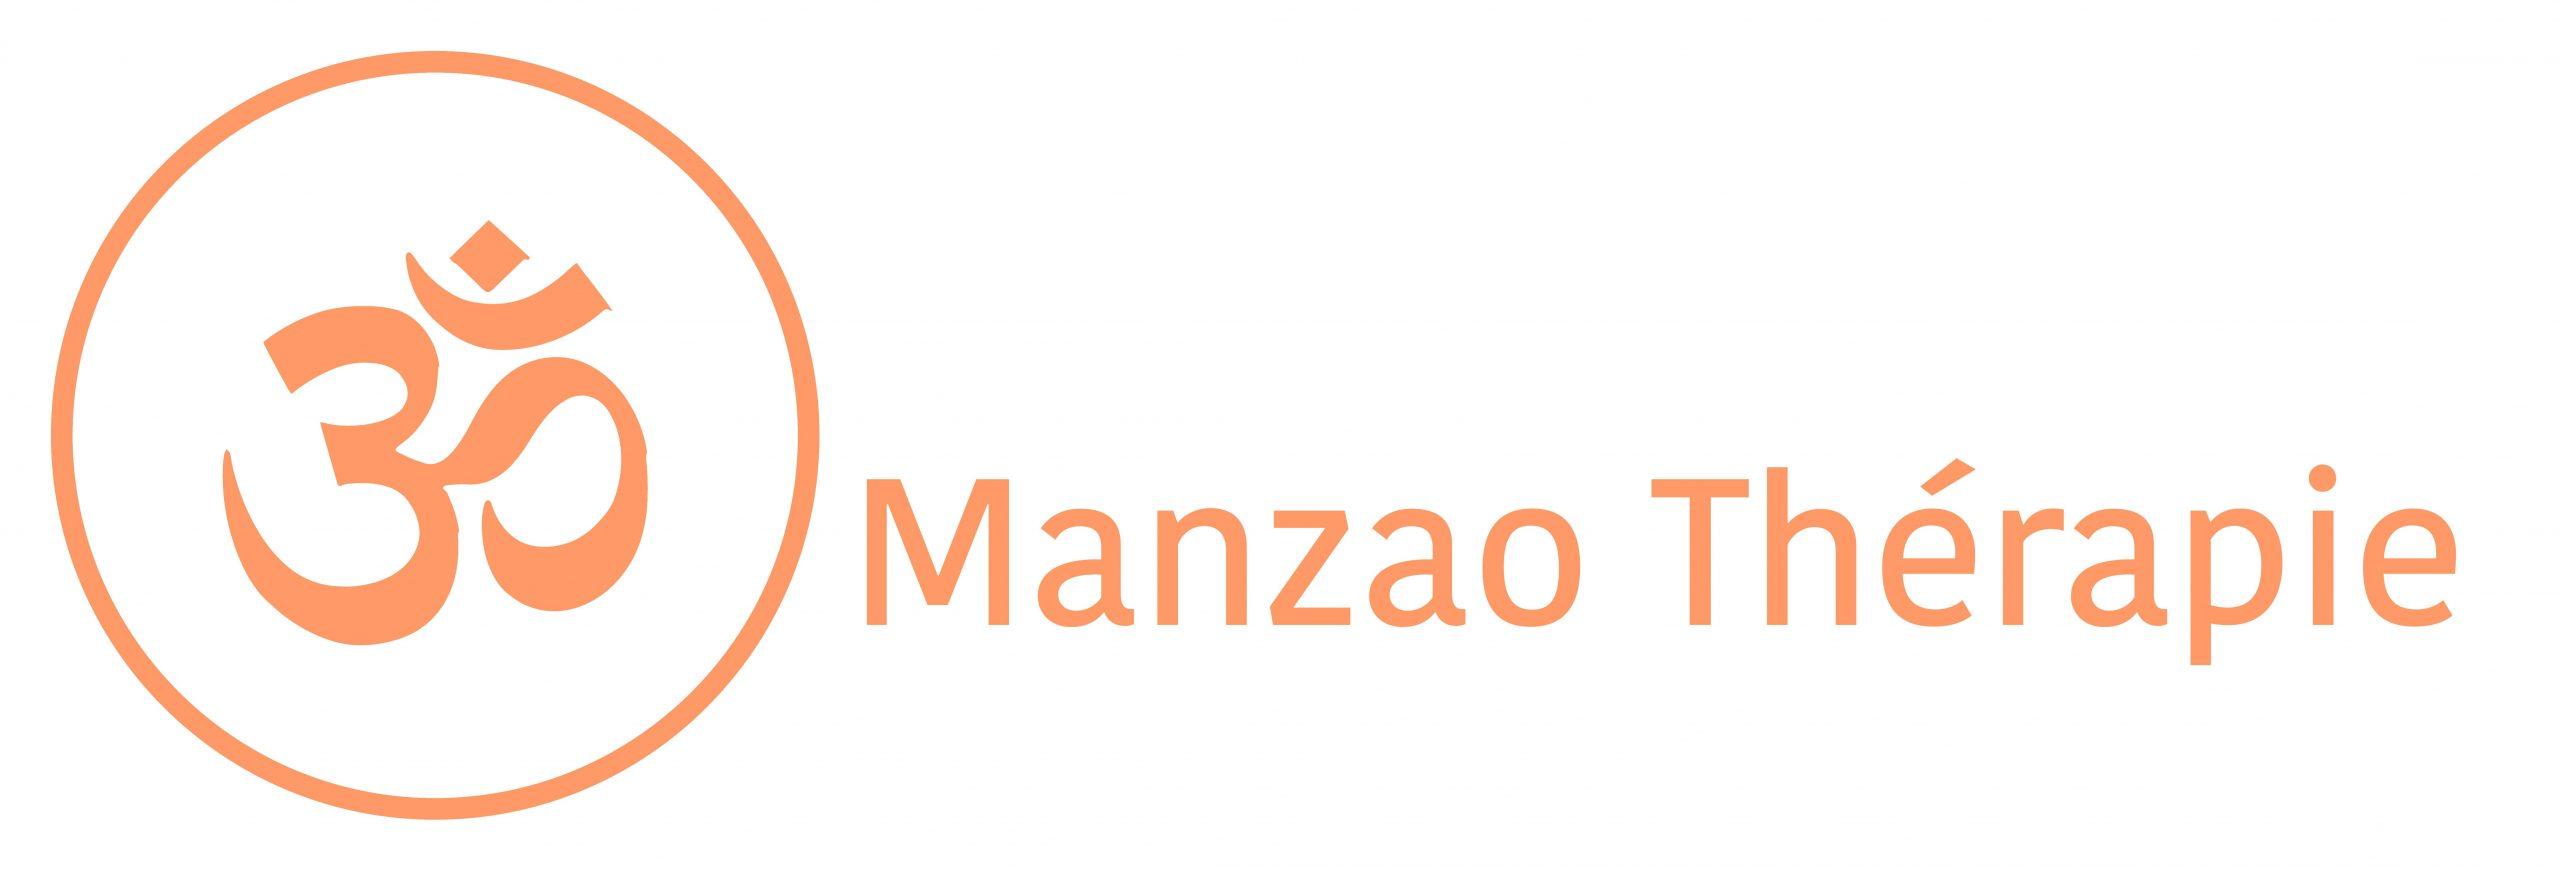 Manzao Therapie